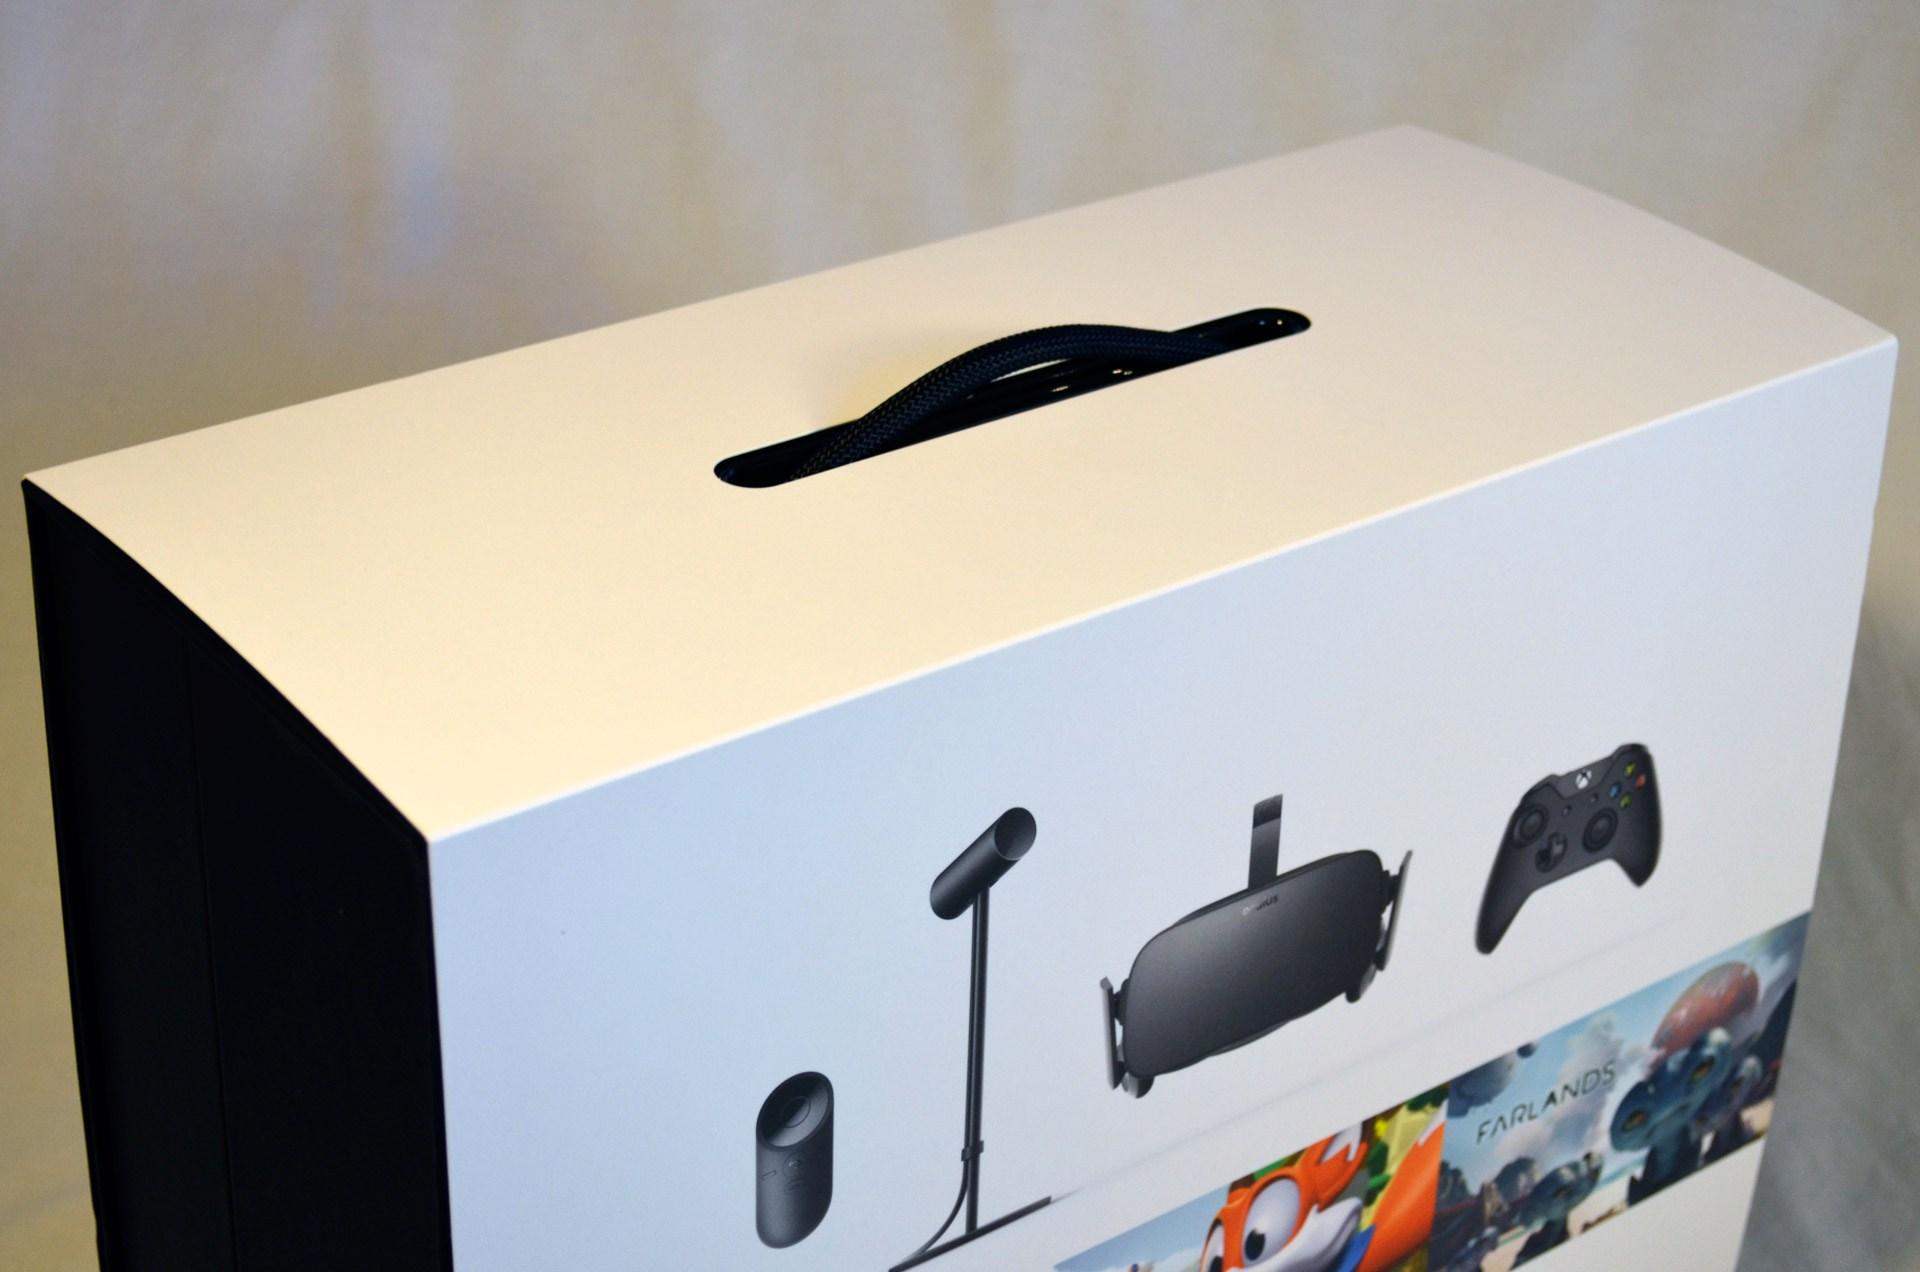 oculus-rift-cv1-unboxing-10.jpg